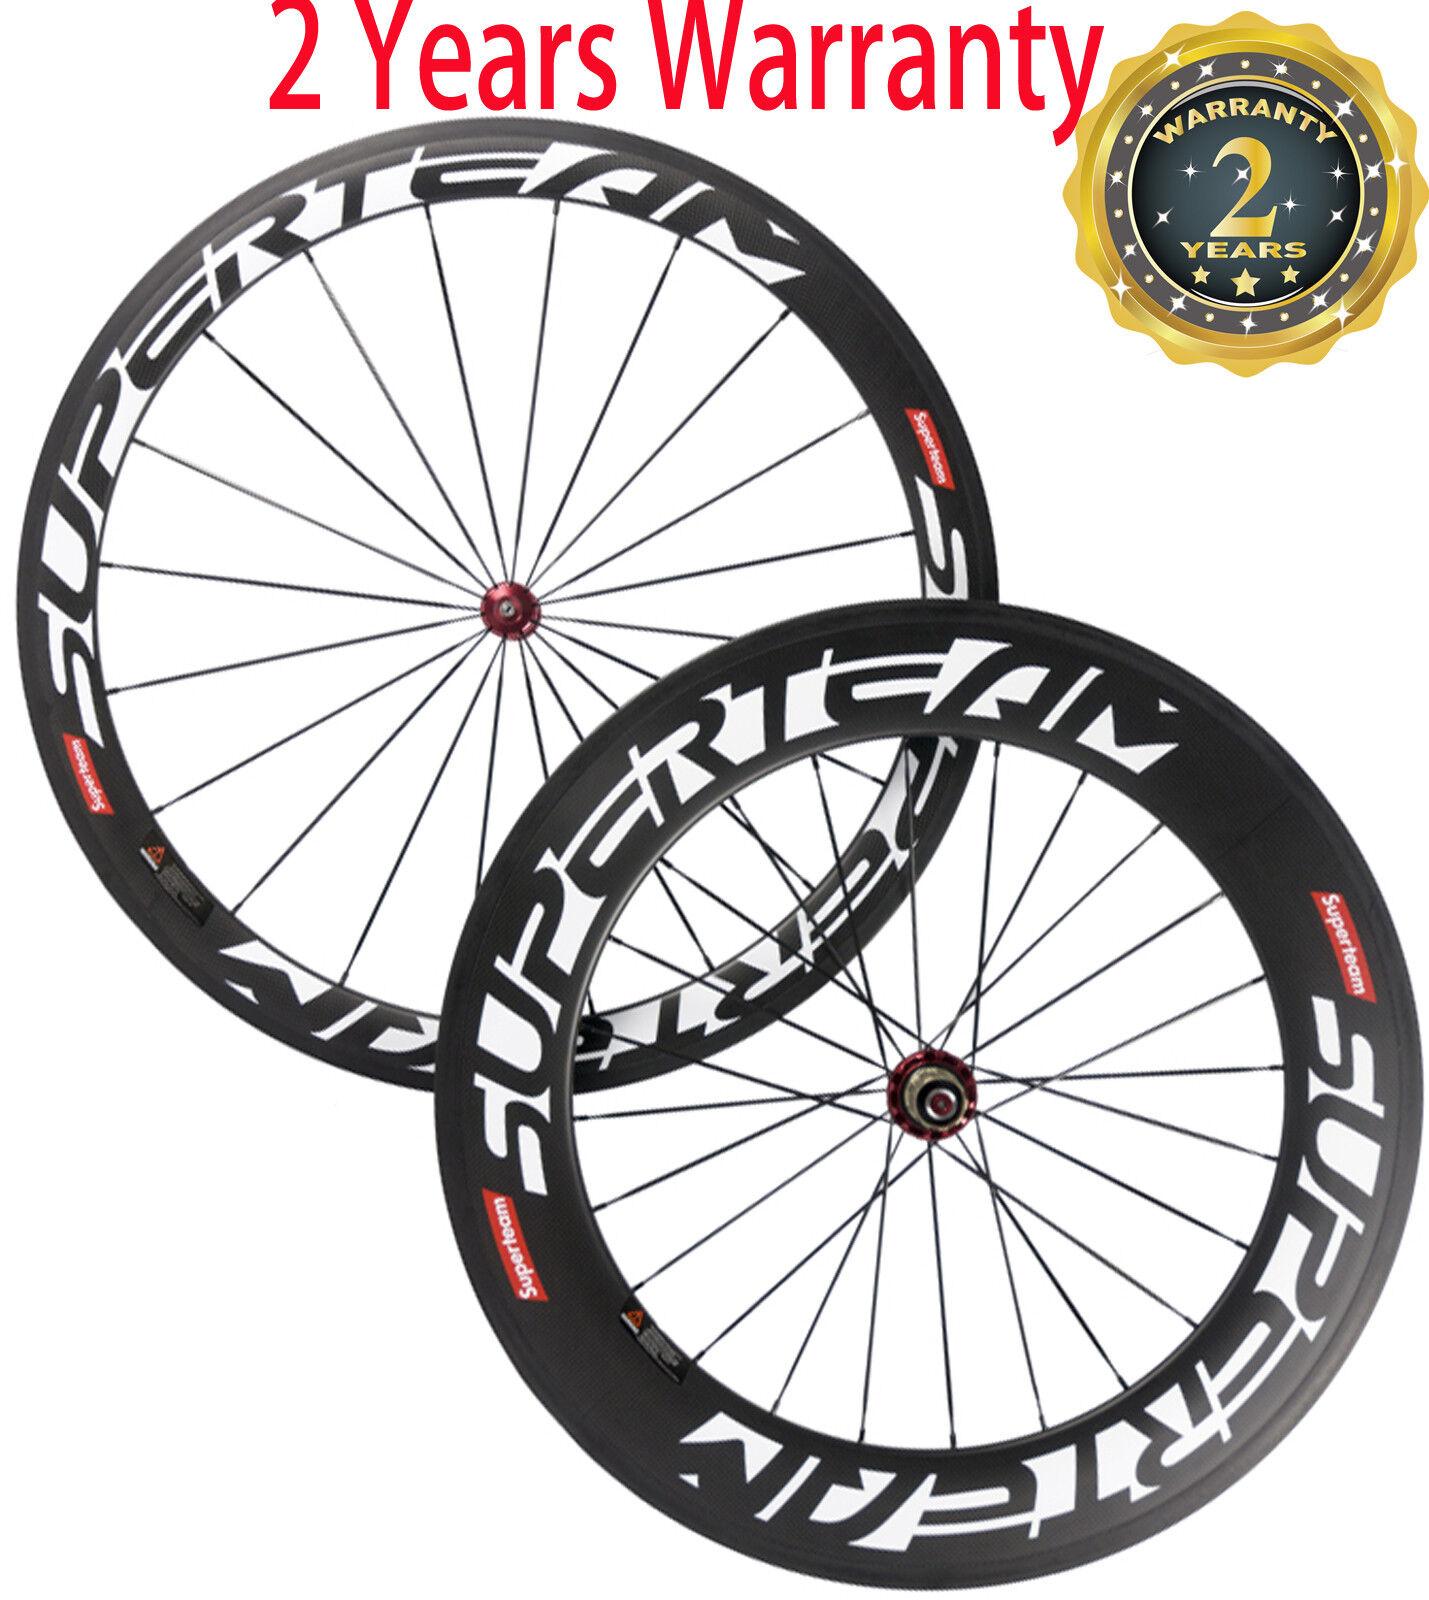 Superteam Front 50mm Rear 88mm Wheels 700C 25mm U Shape Carbon Bicycle Wheelset